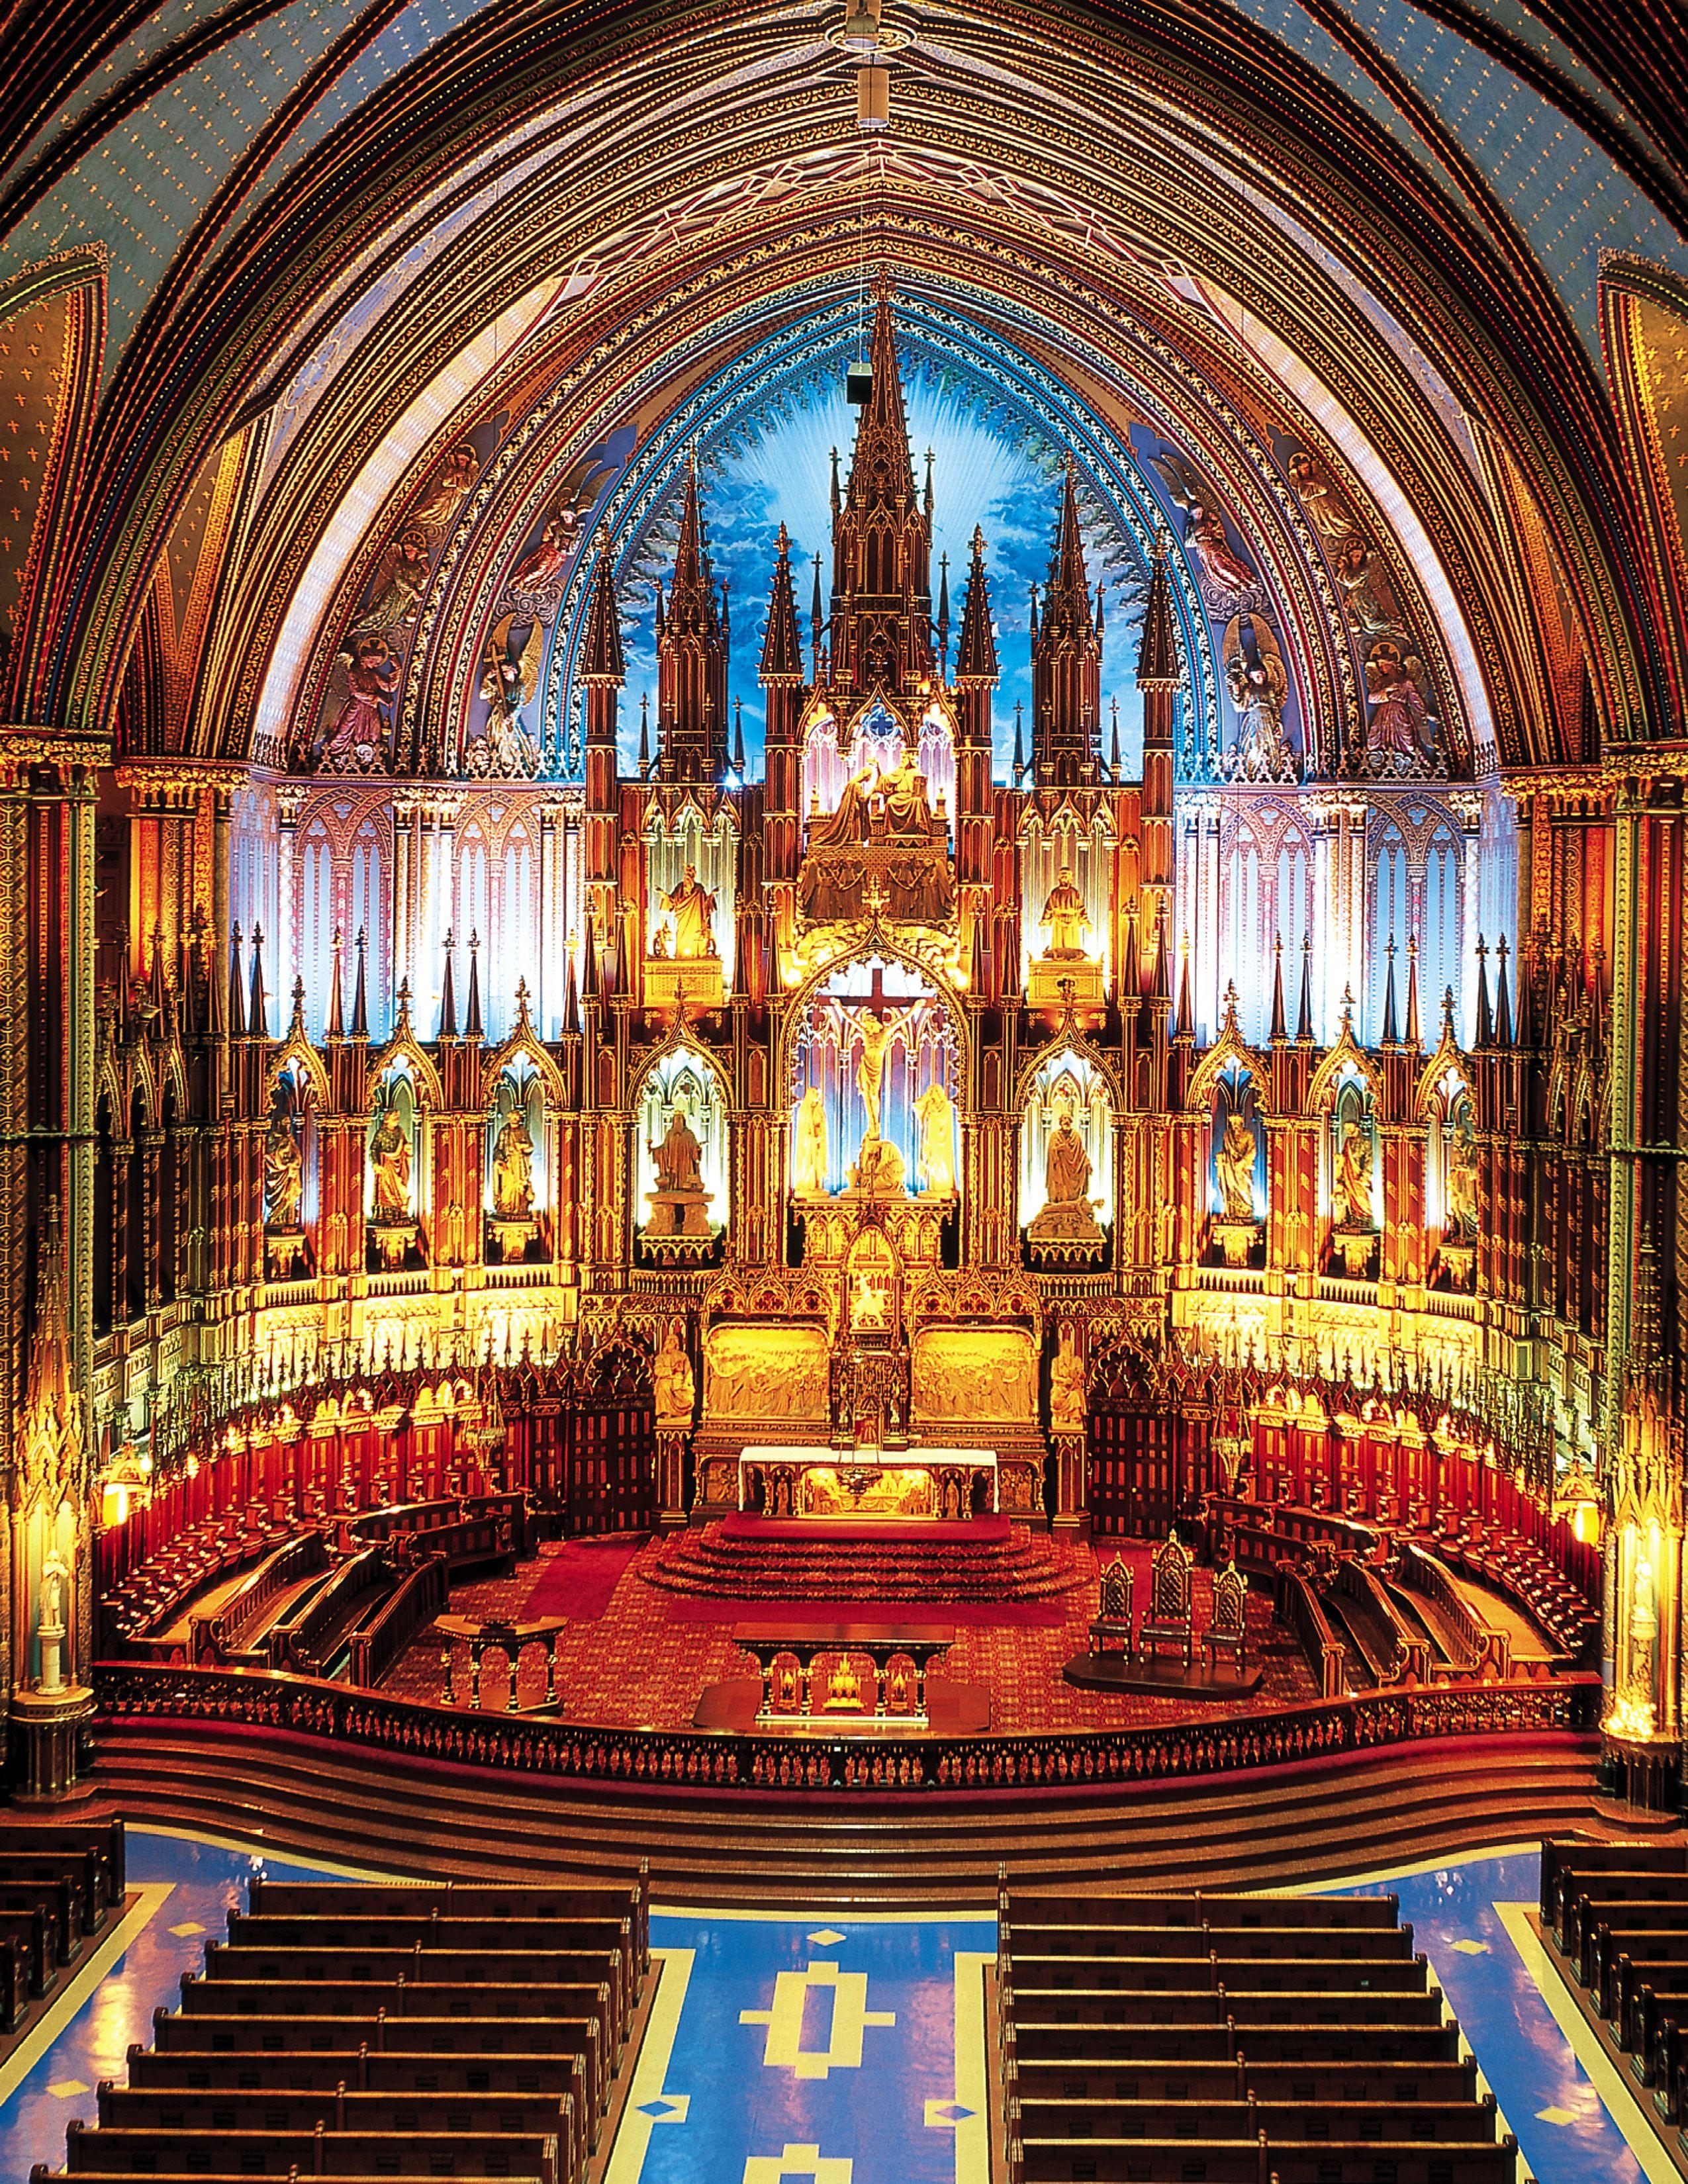 Notre-Dame Basilica - Basilique Notre-Dame: The oldest